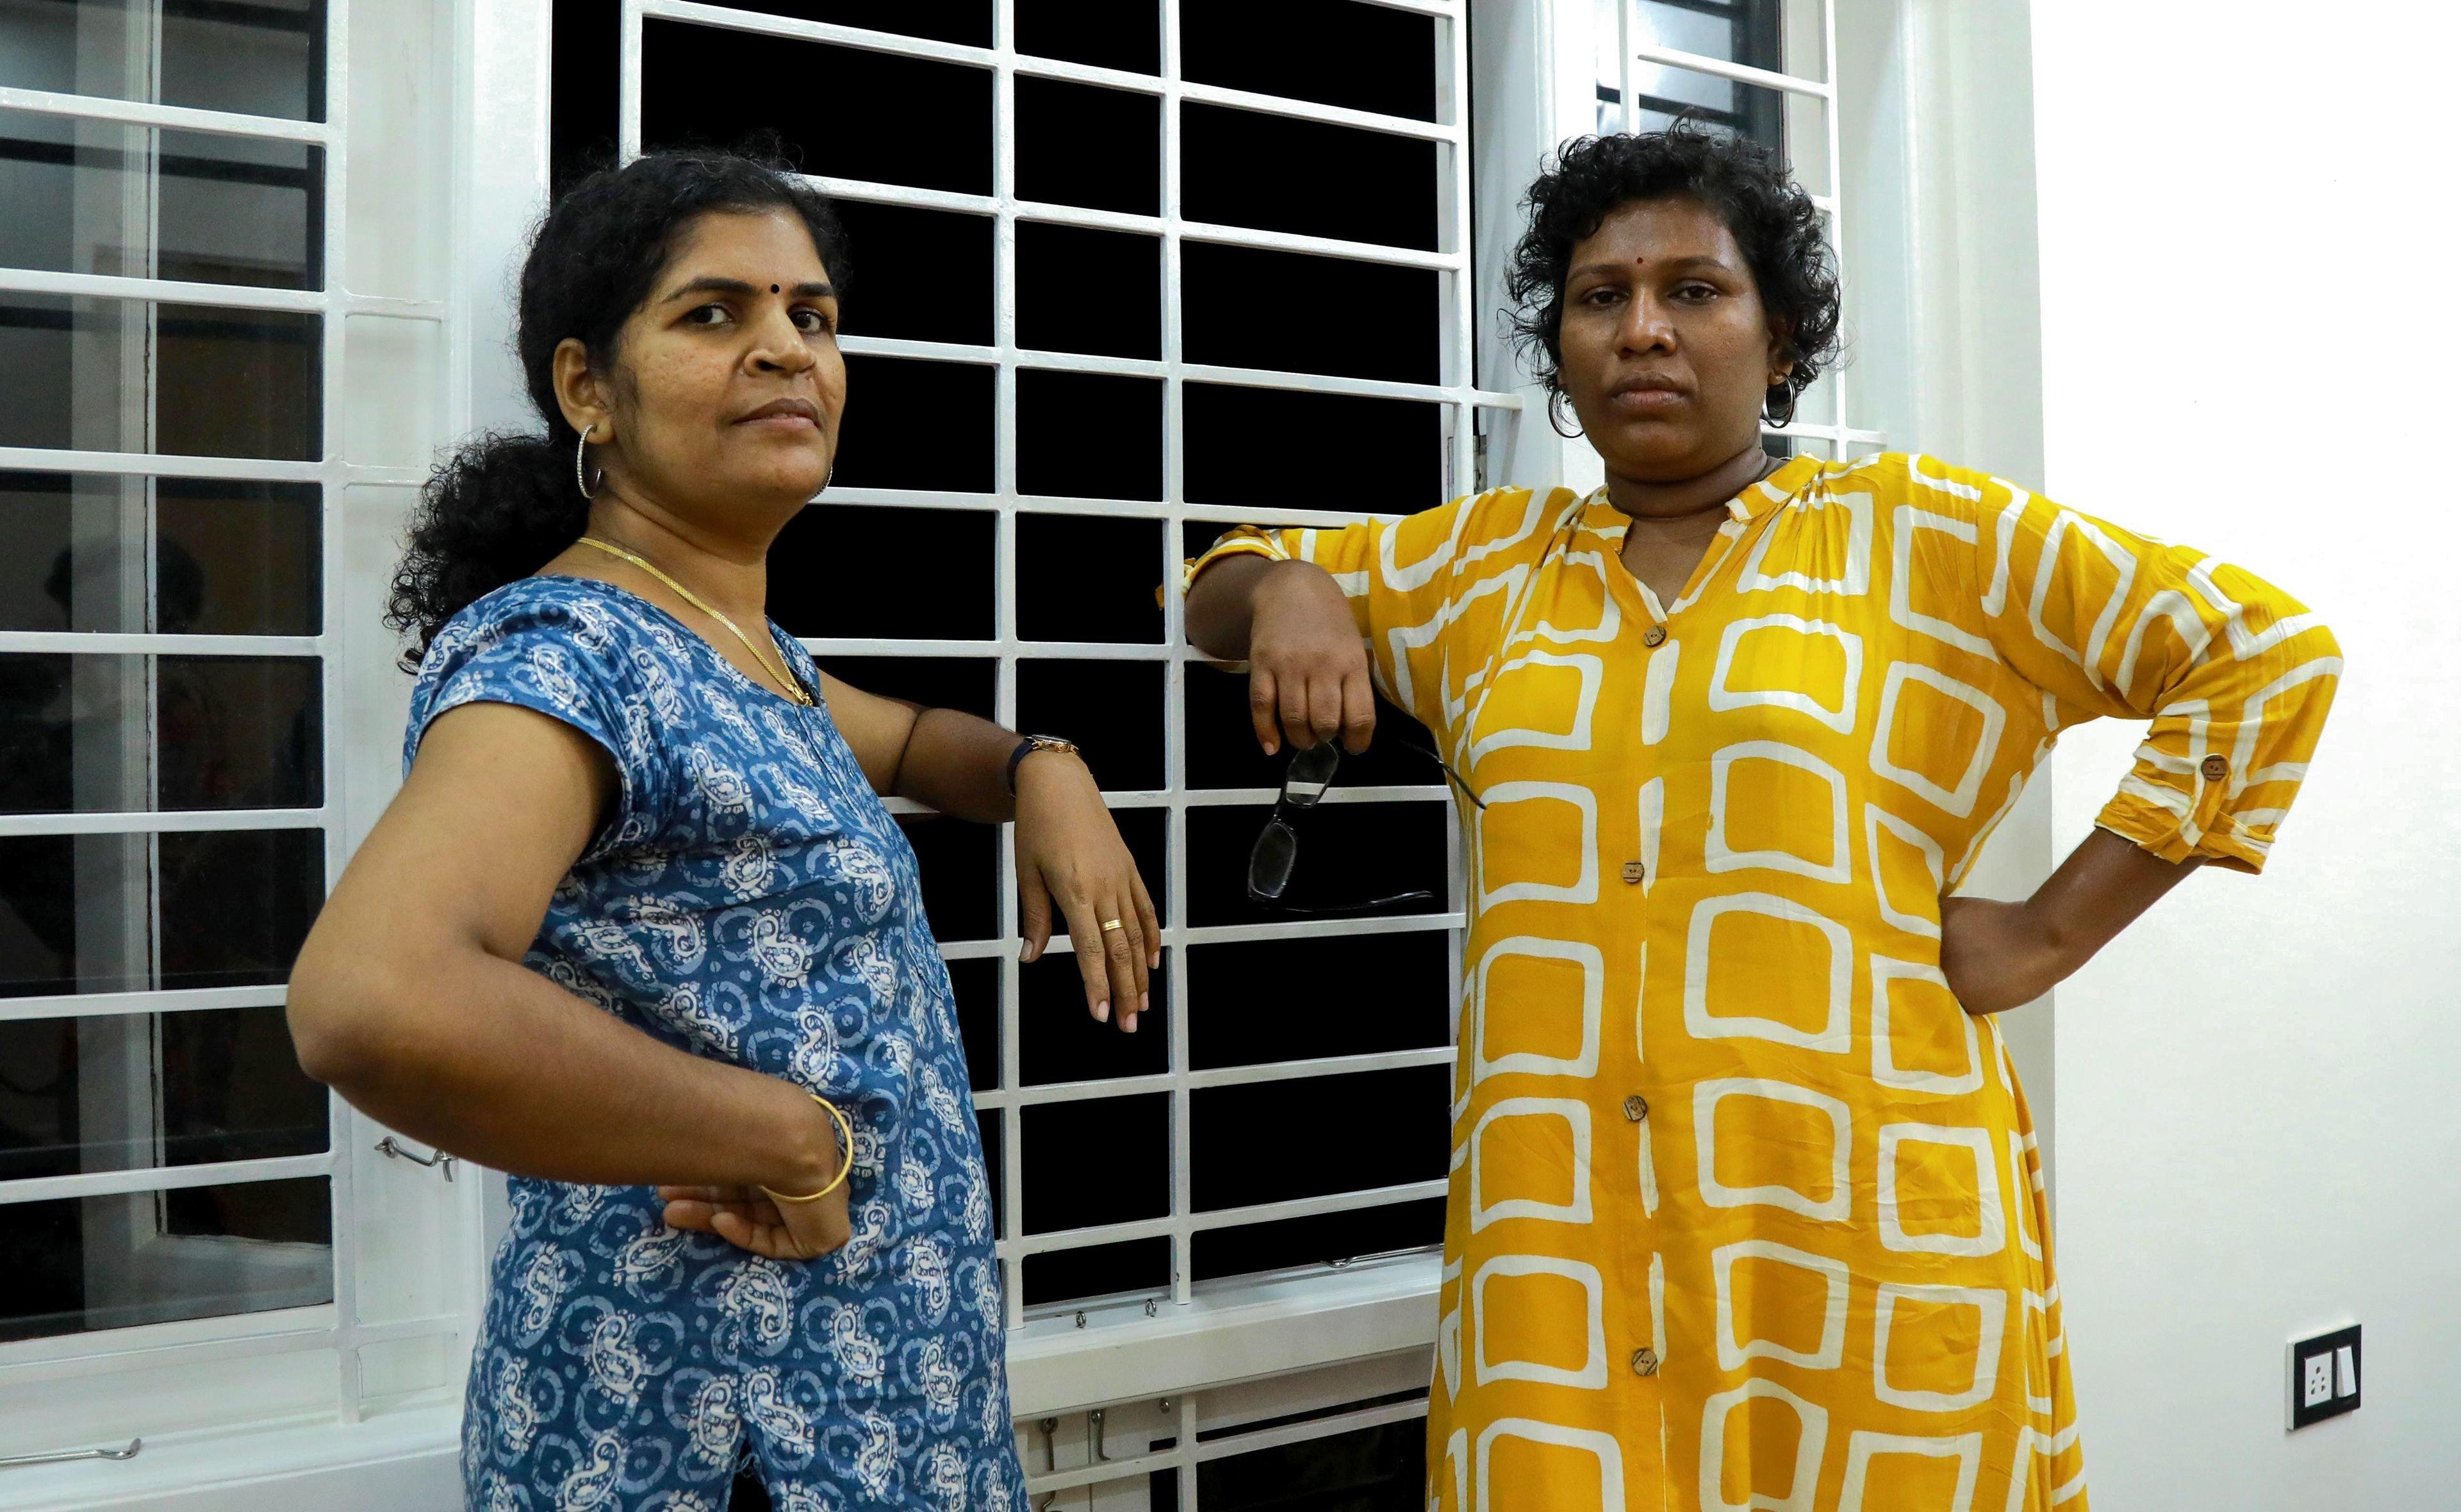 I Will Not Say Sorry, Says Kanakadurga After Family Disowns Her For Sabarimala